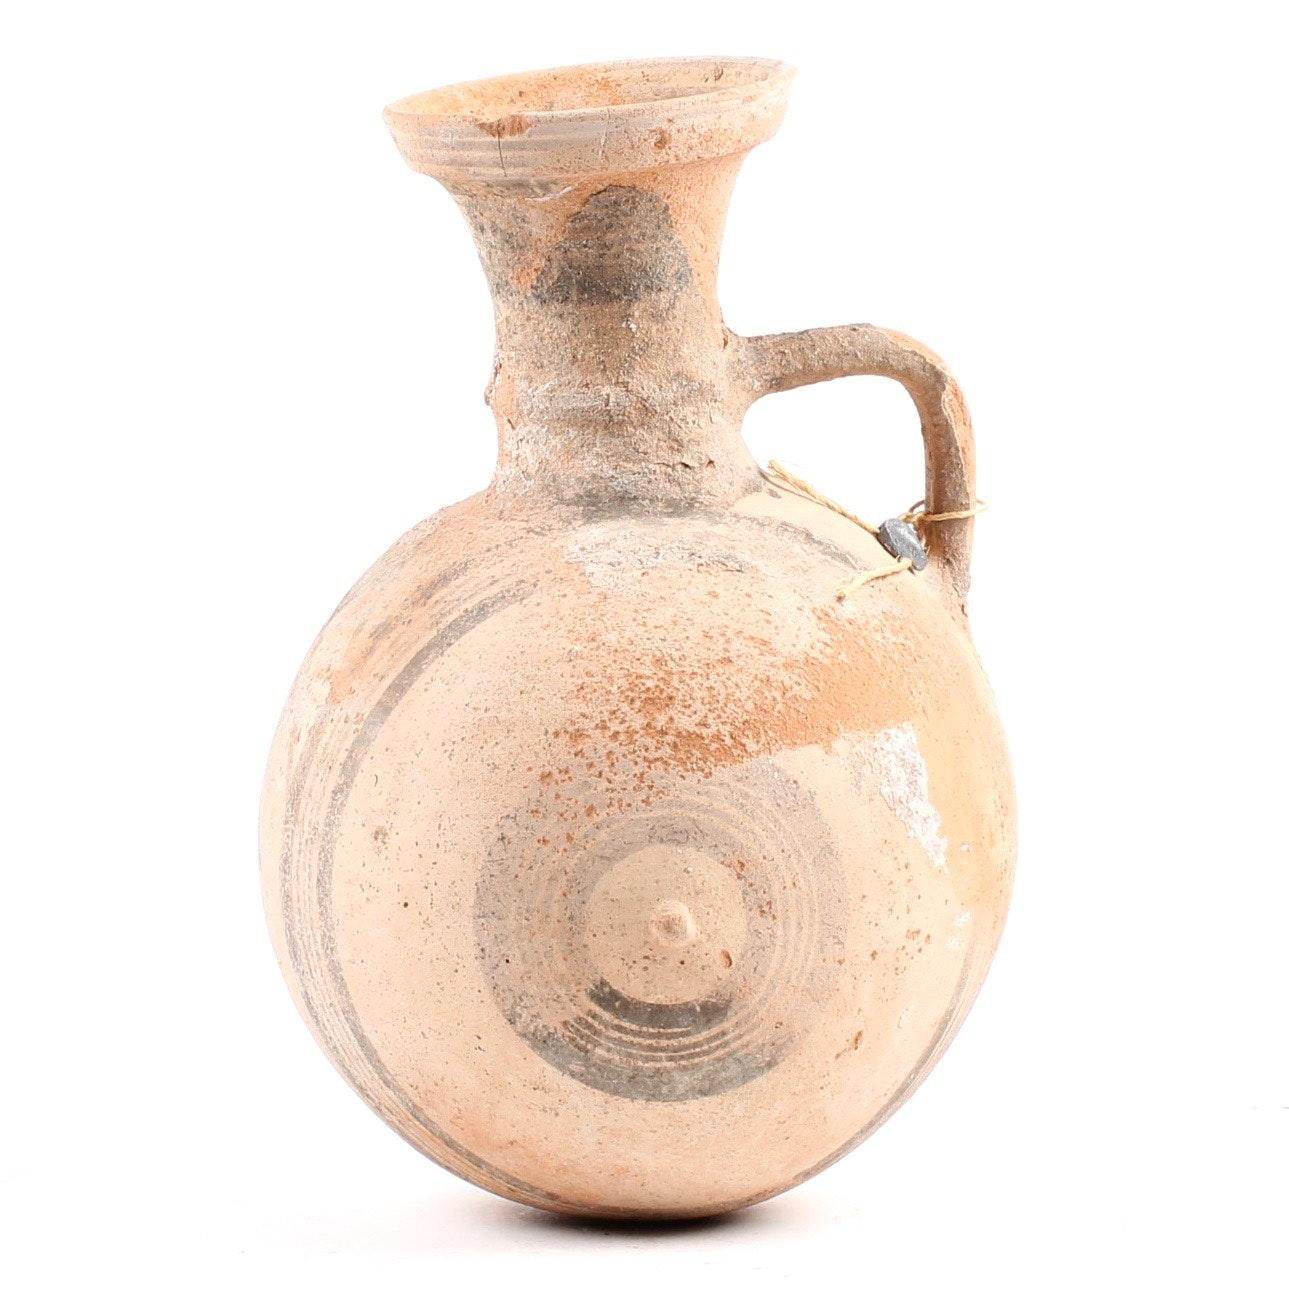 Cypriot Culture Barrel-Jug 850-700 B.C.E. Cypro-Geometric III Period Clay